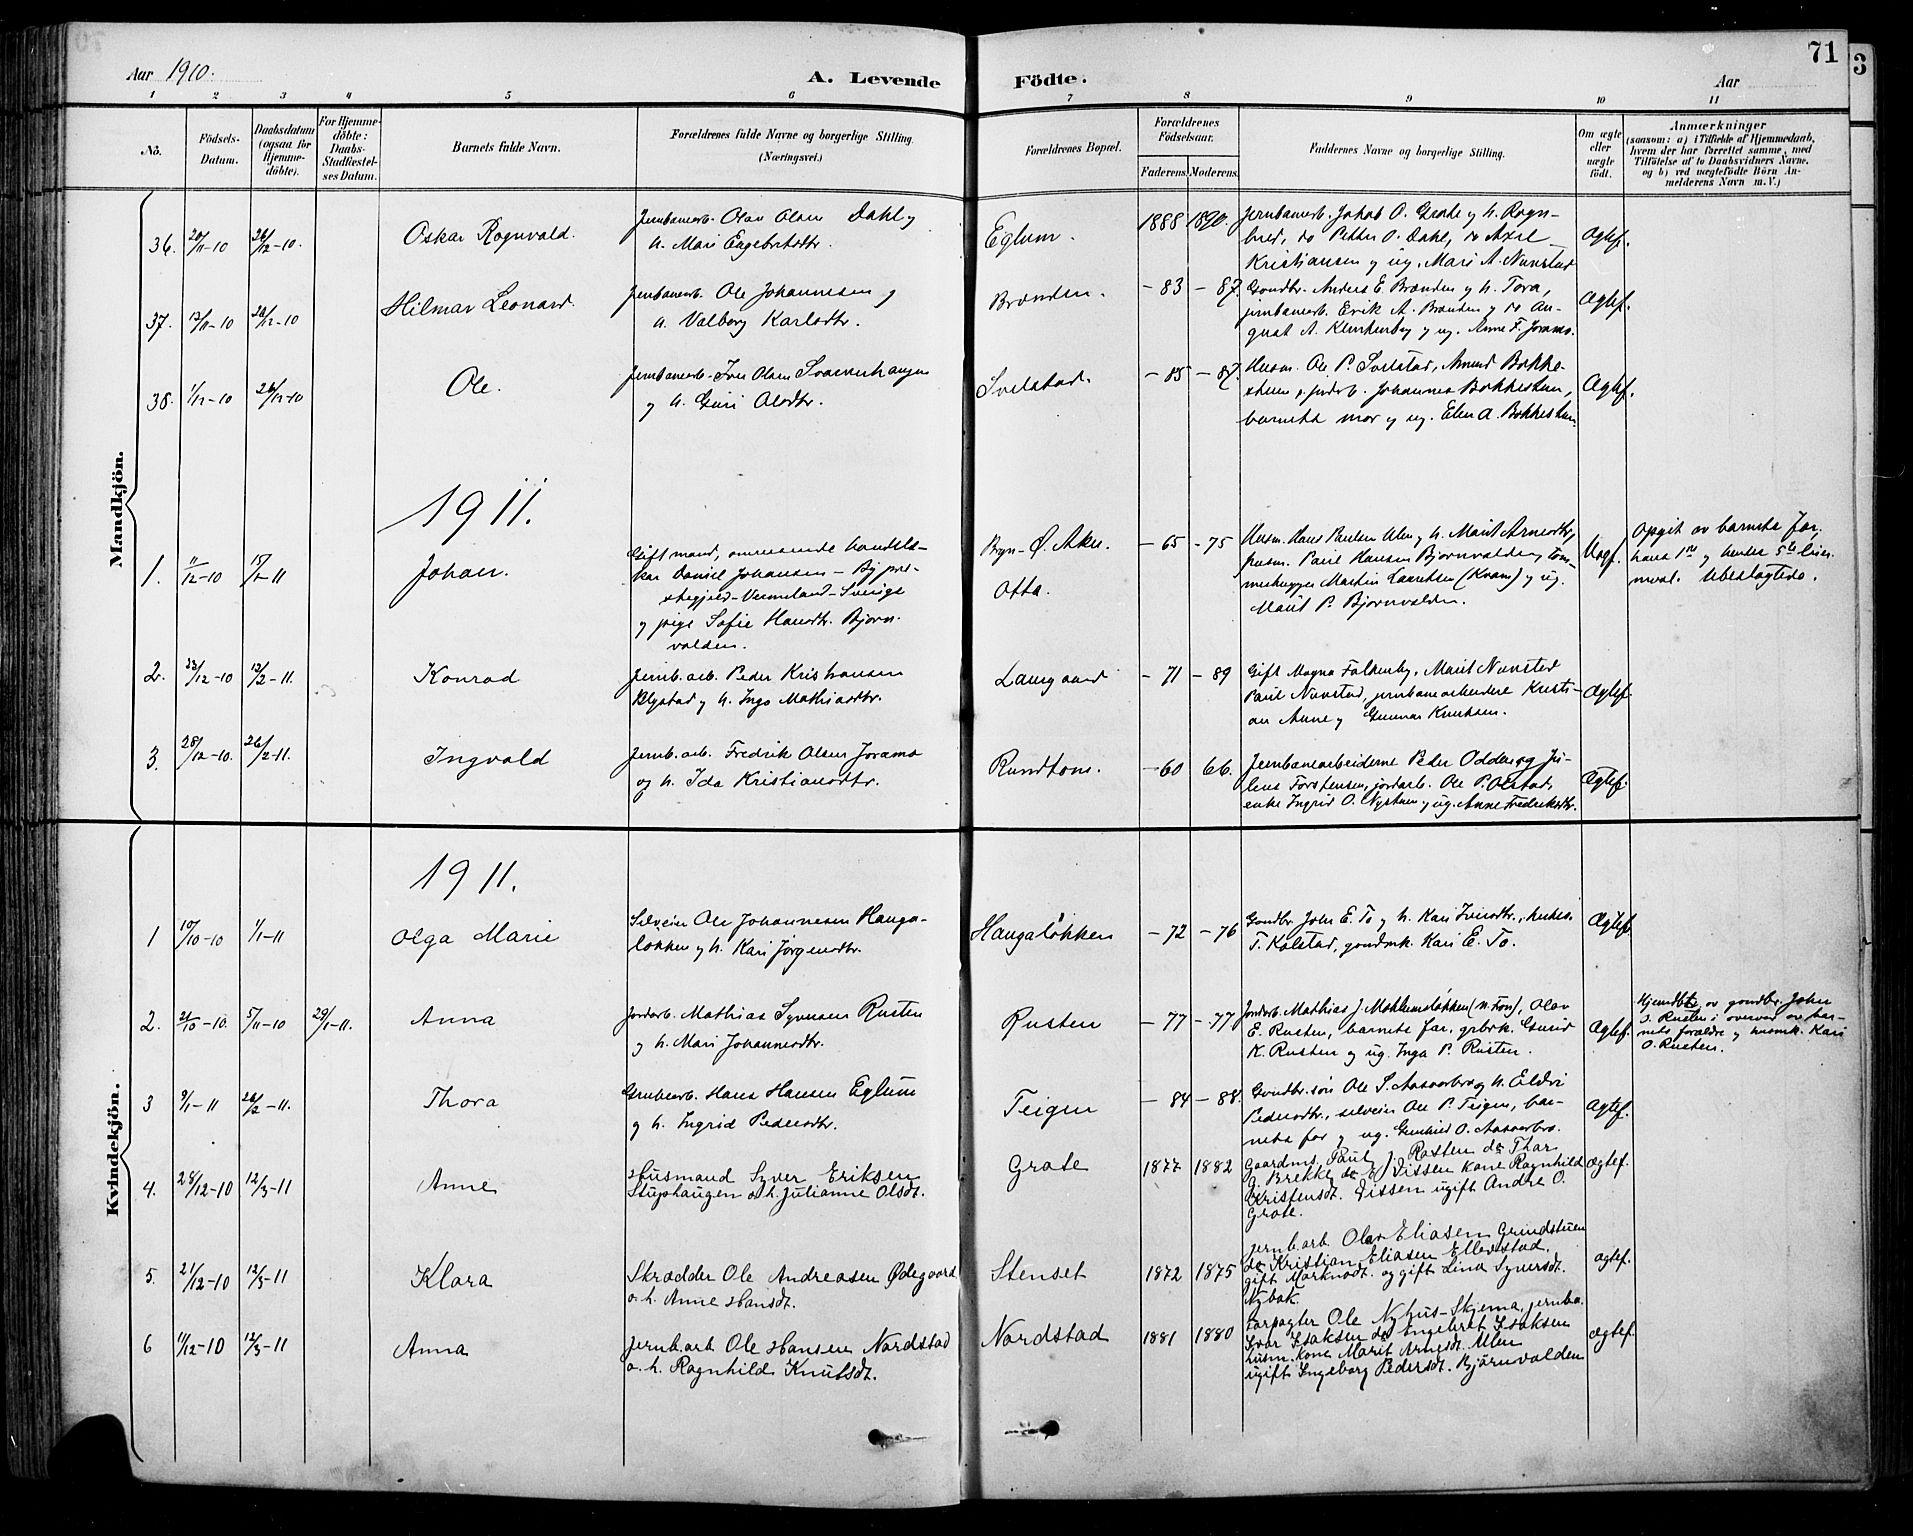 SAH, Sel prestekontor, Klokkerbok nr. 1, 1894-1923, s. 71